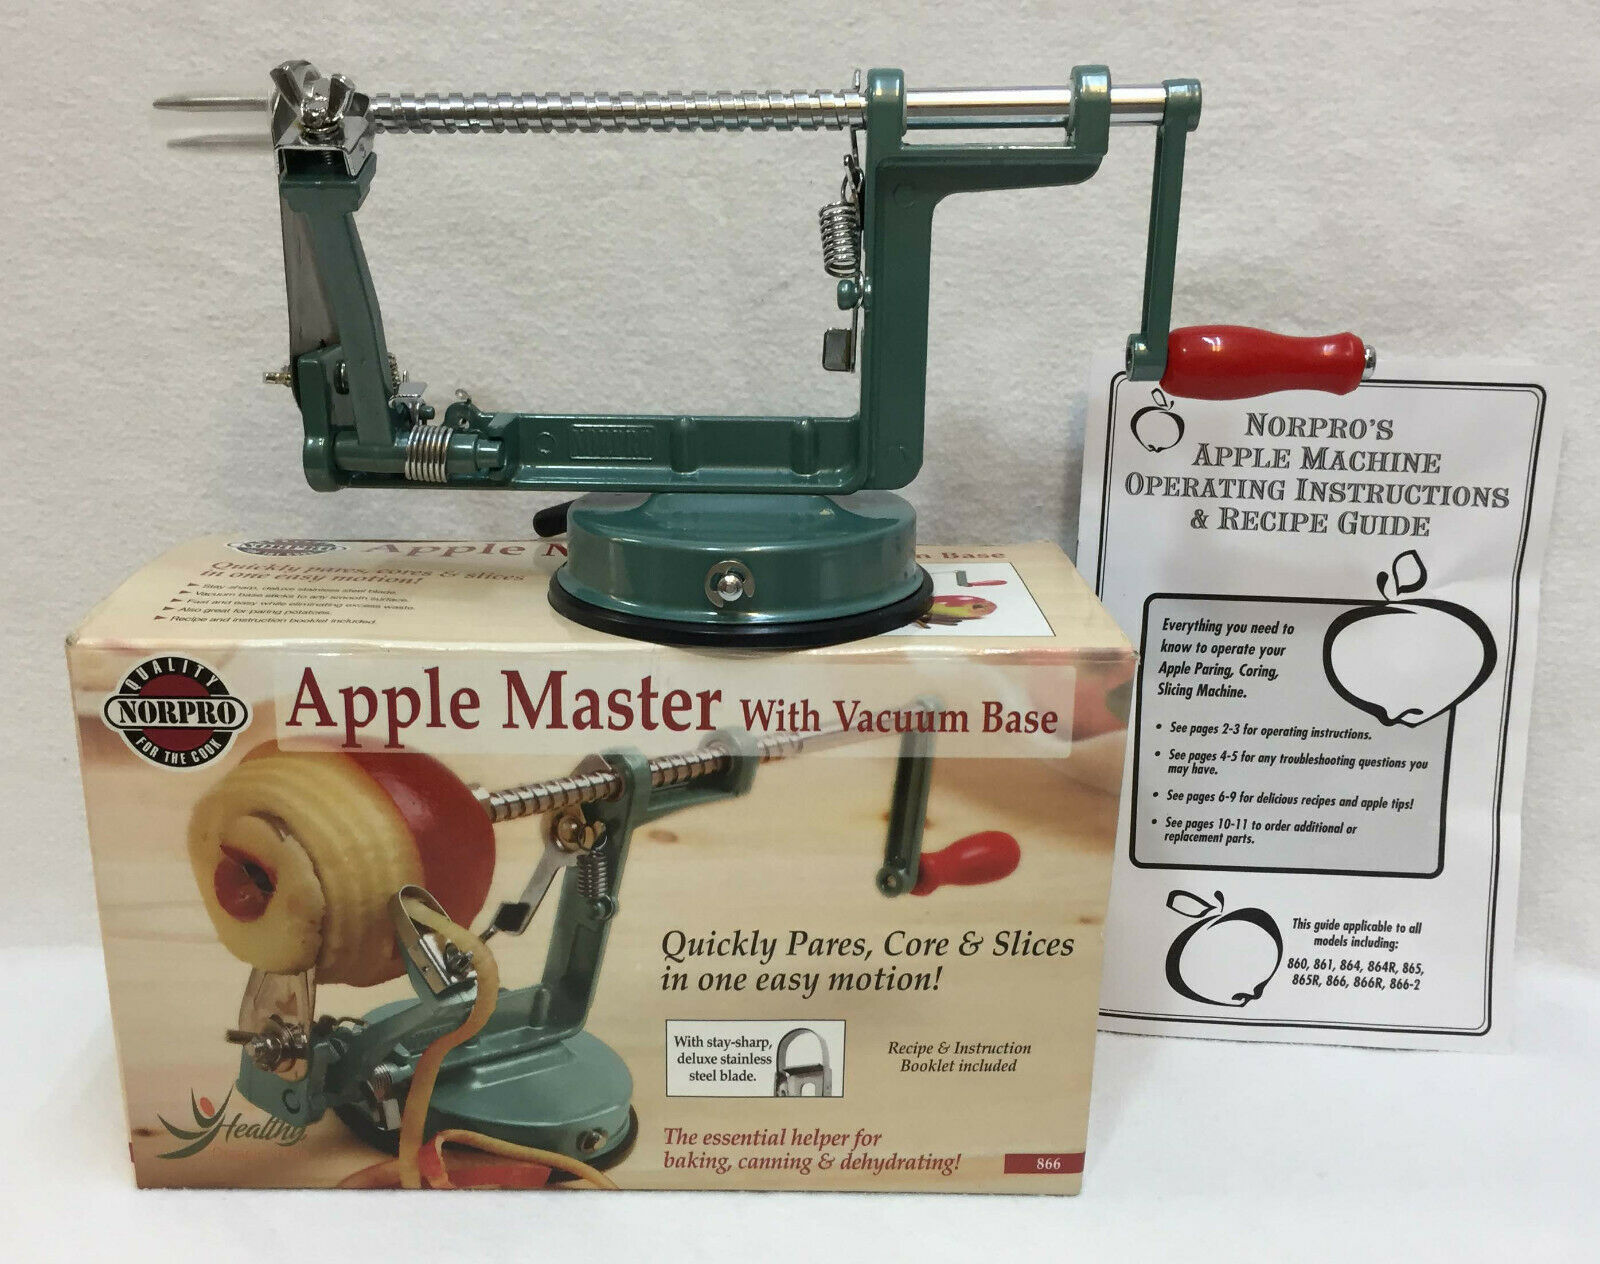 Norpro Apple Master Apple Peeler Parer Corer & Slicer w/ Vacuum Base #866 - $24.74